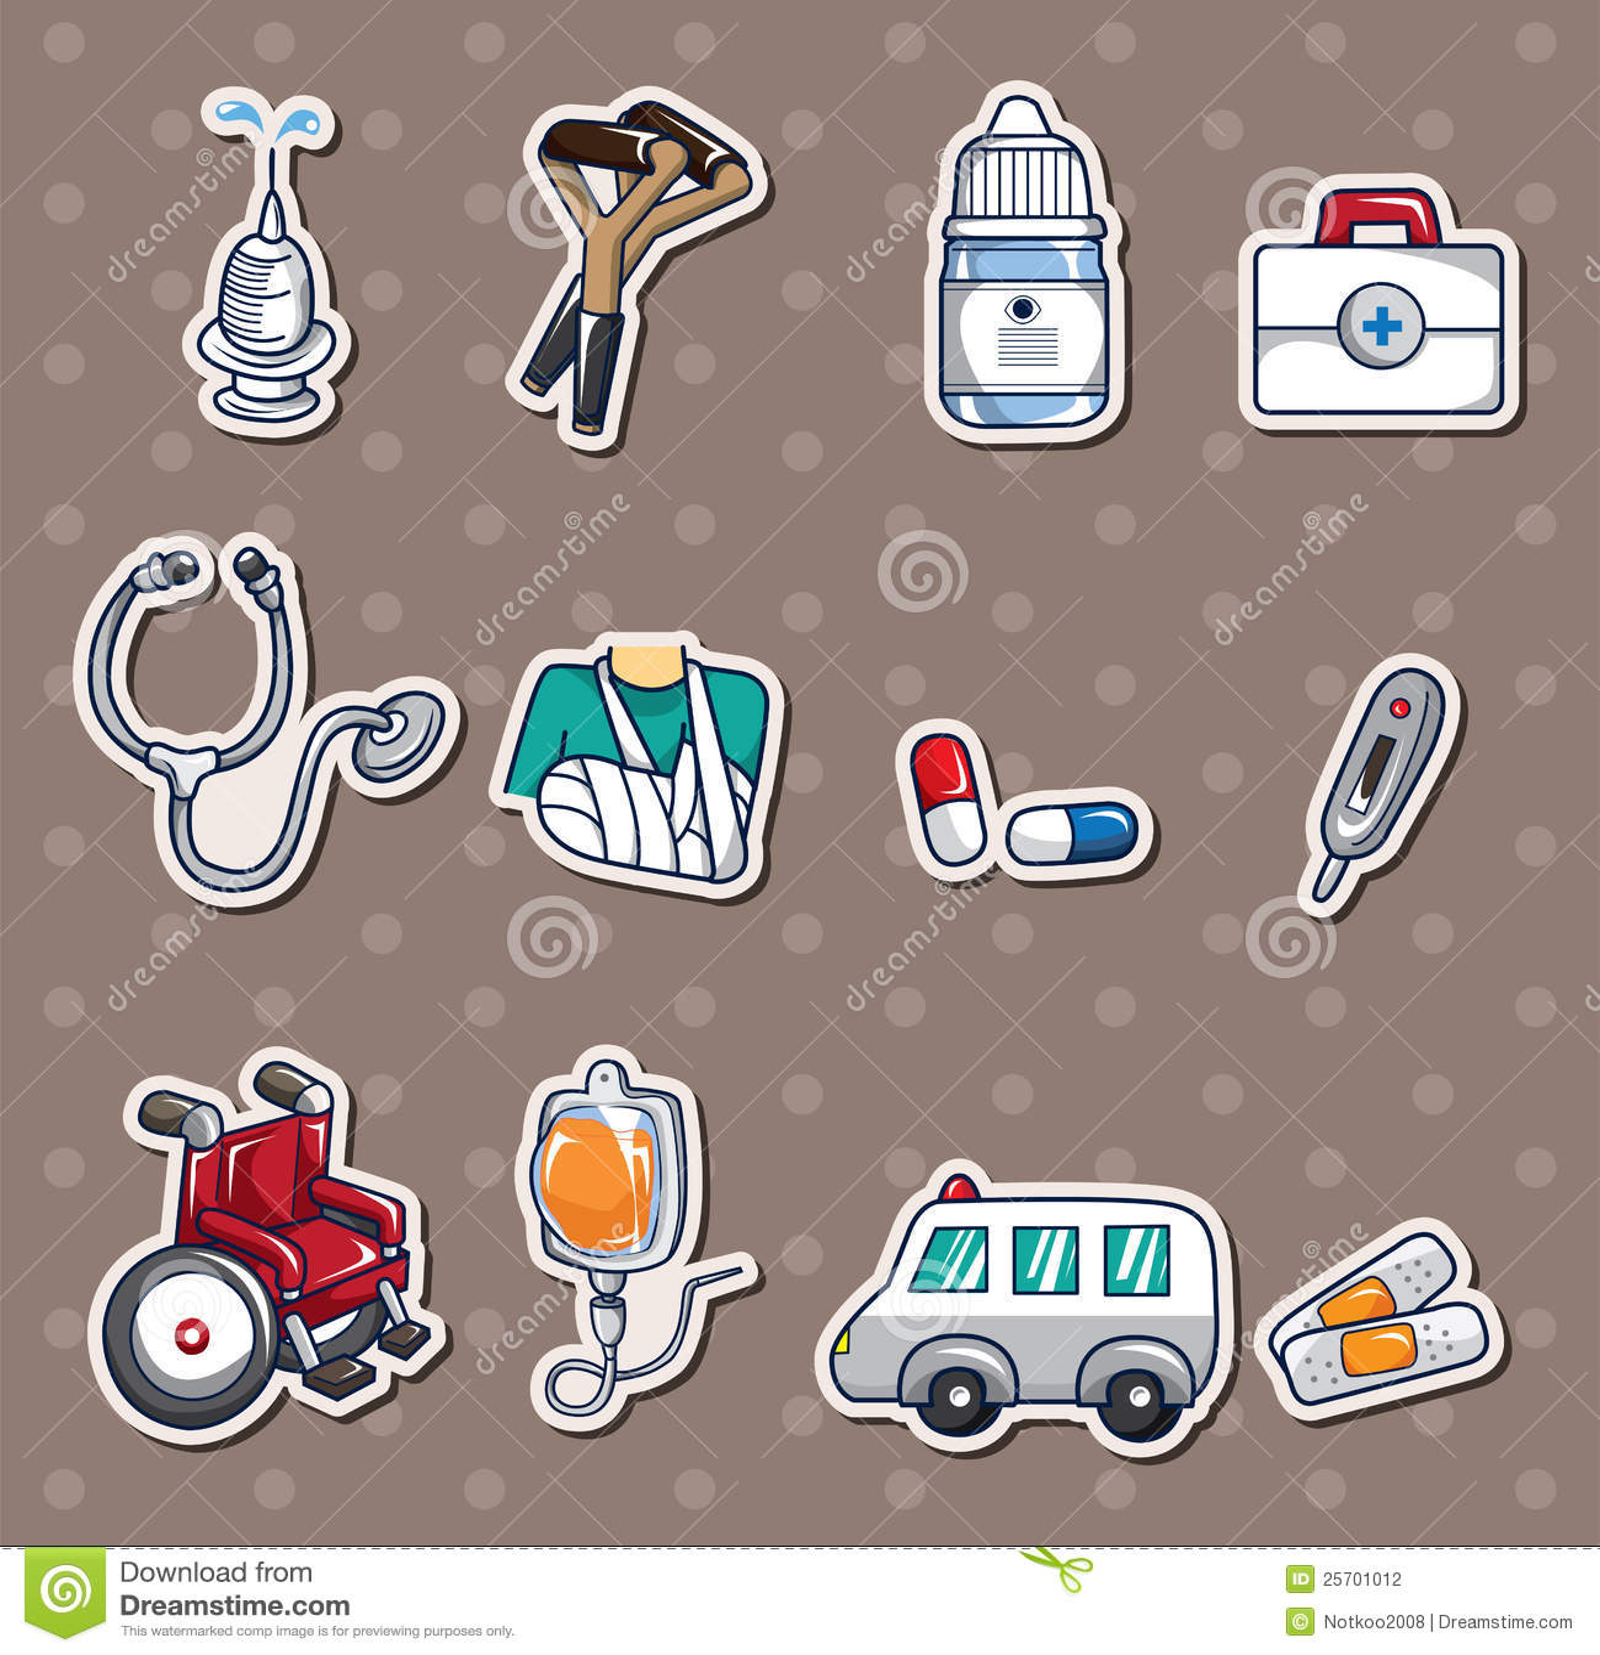 Hospital Stickers Stock Photography  Image 25701012. Dental Signs Of Stroke. Batman Family Decals. Garage Sale Stickers. Non Hodgkin Signs. Diary Banners. Golden Retriever Stickers. Longwood Logo. Kindergarten School Logo